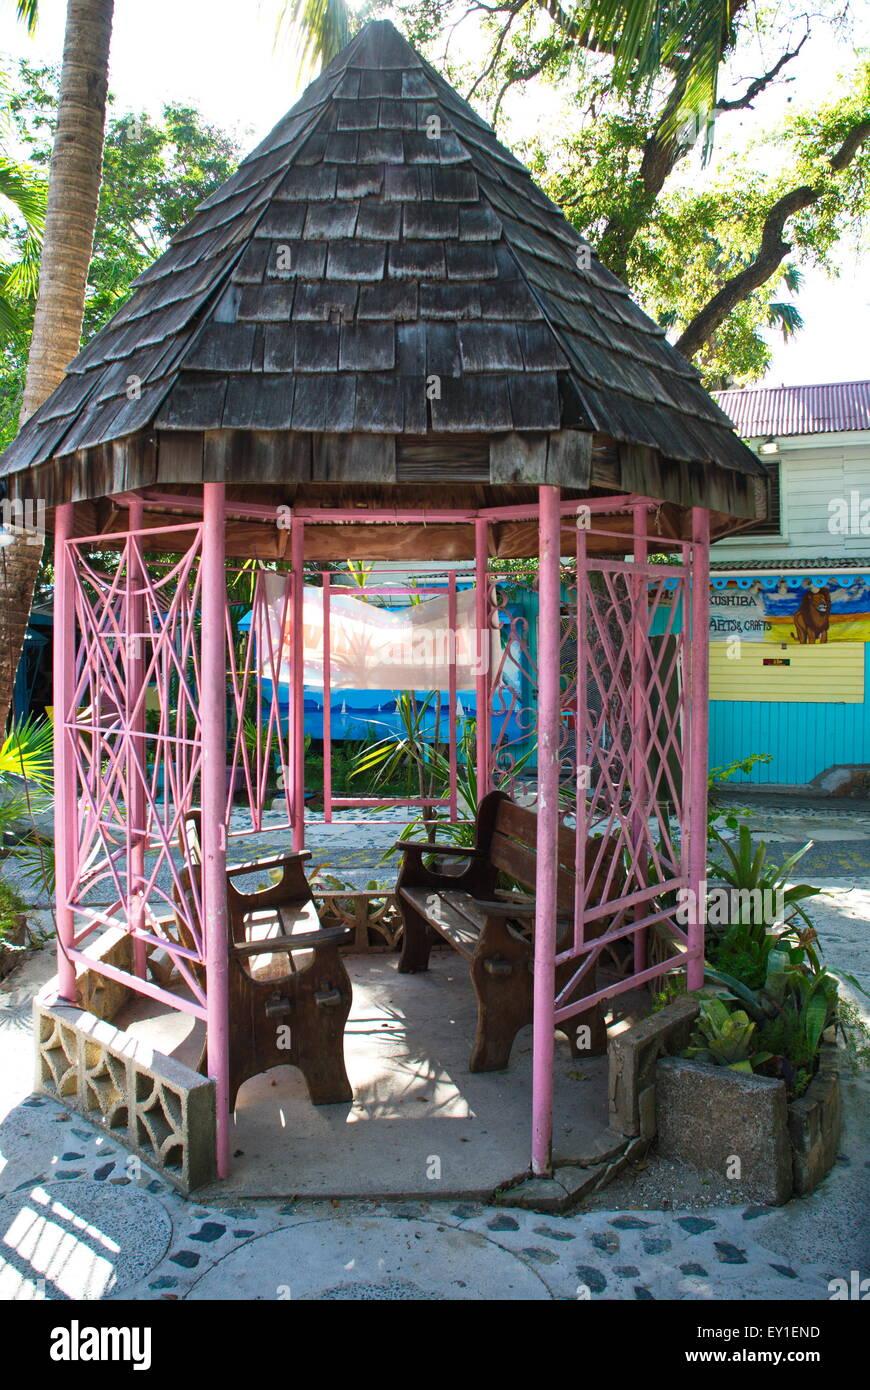 Bunte Rosa Bambus Pavillon Ruhestatte In Bunten Markt Gebauden